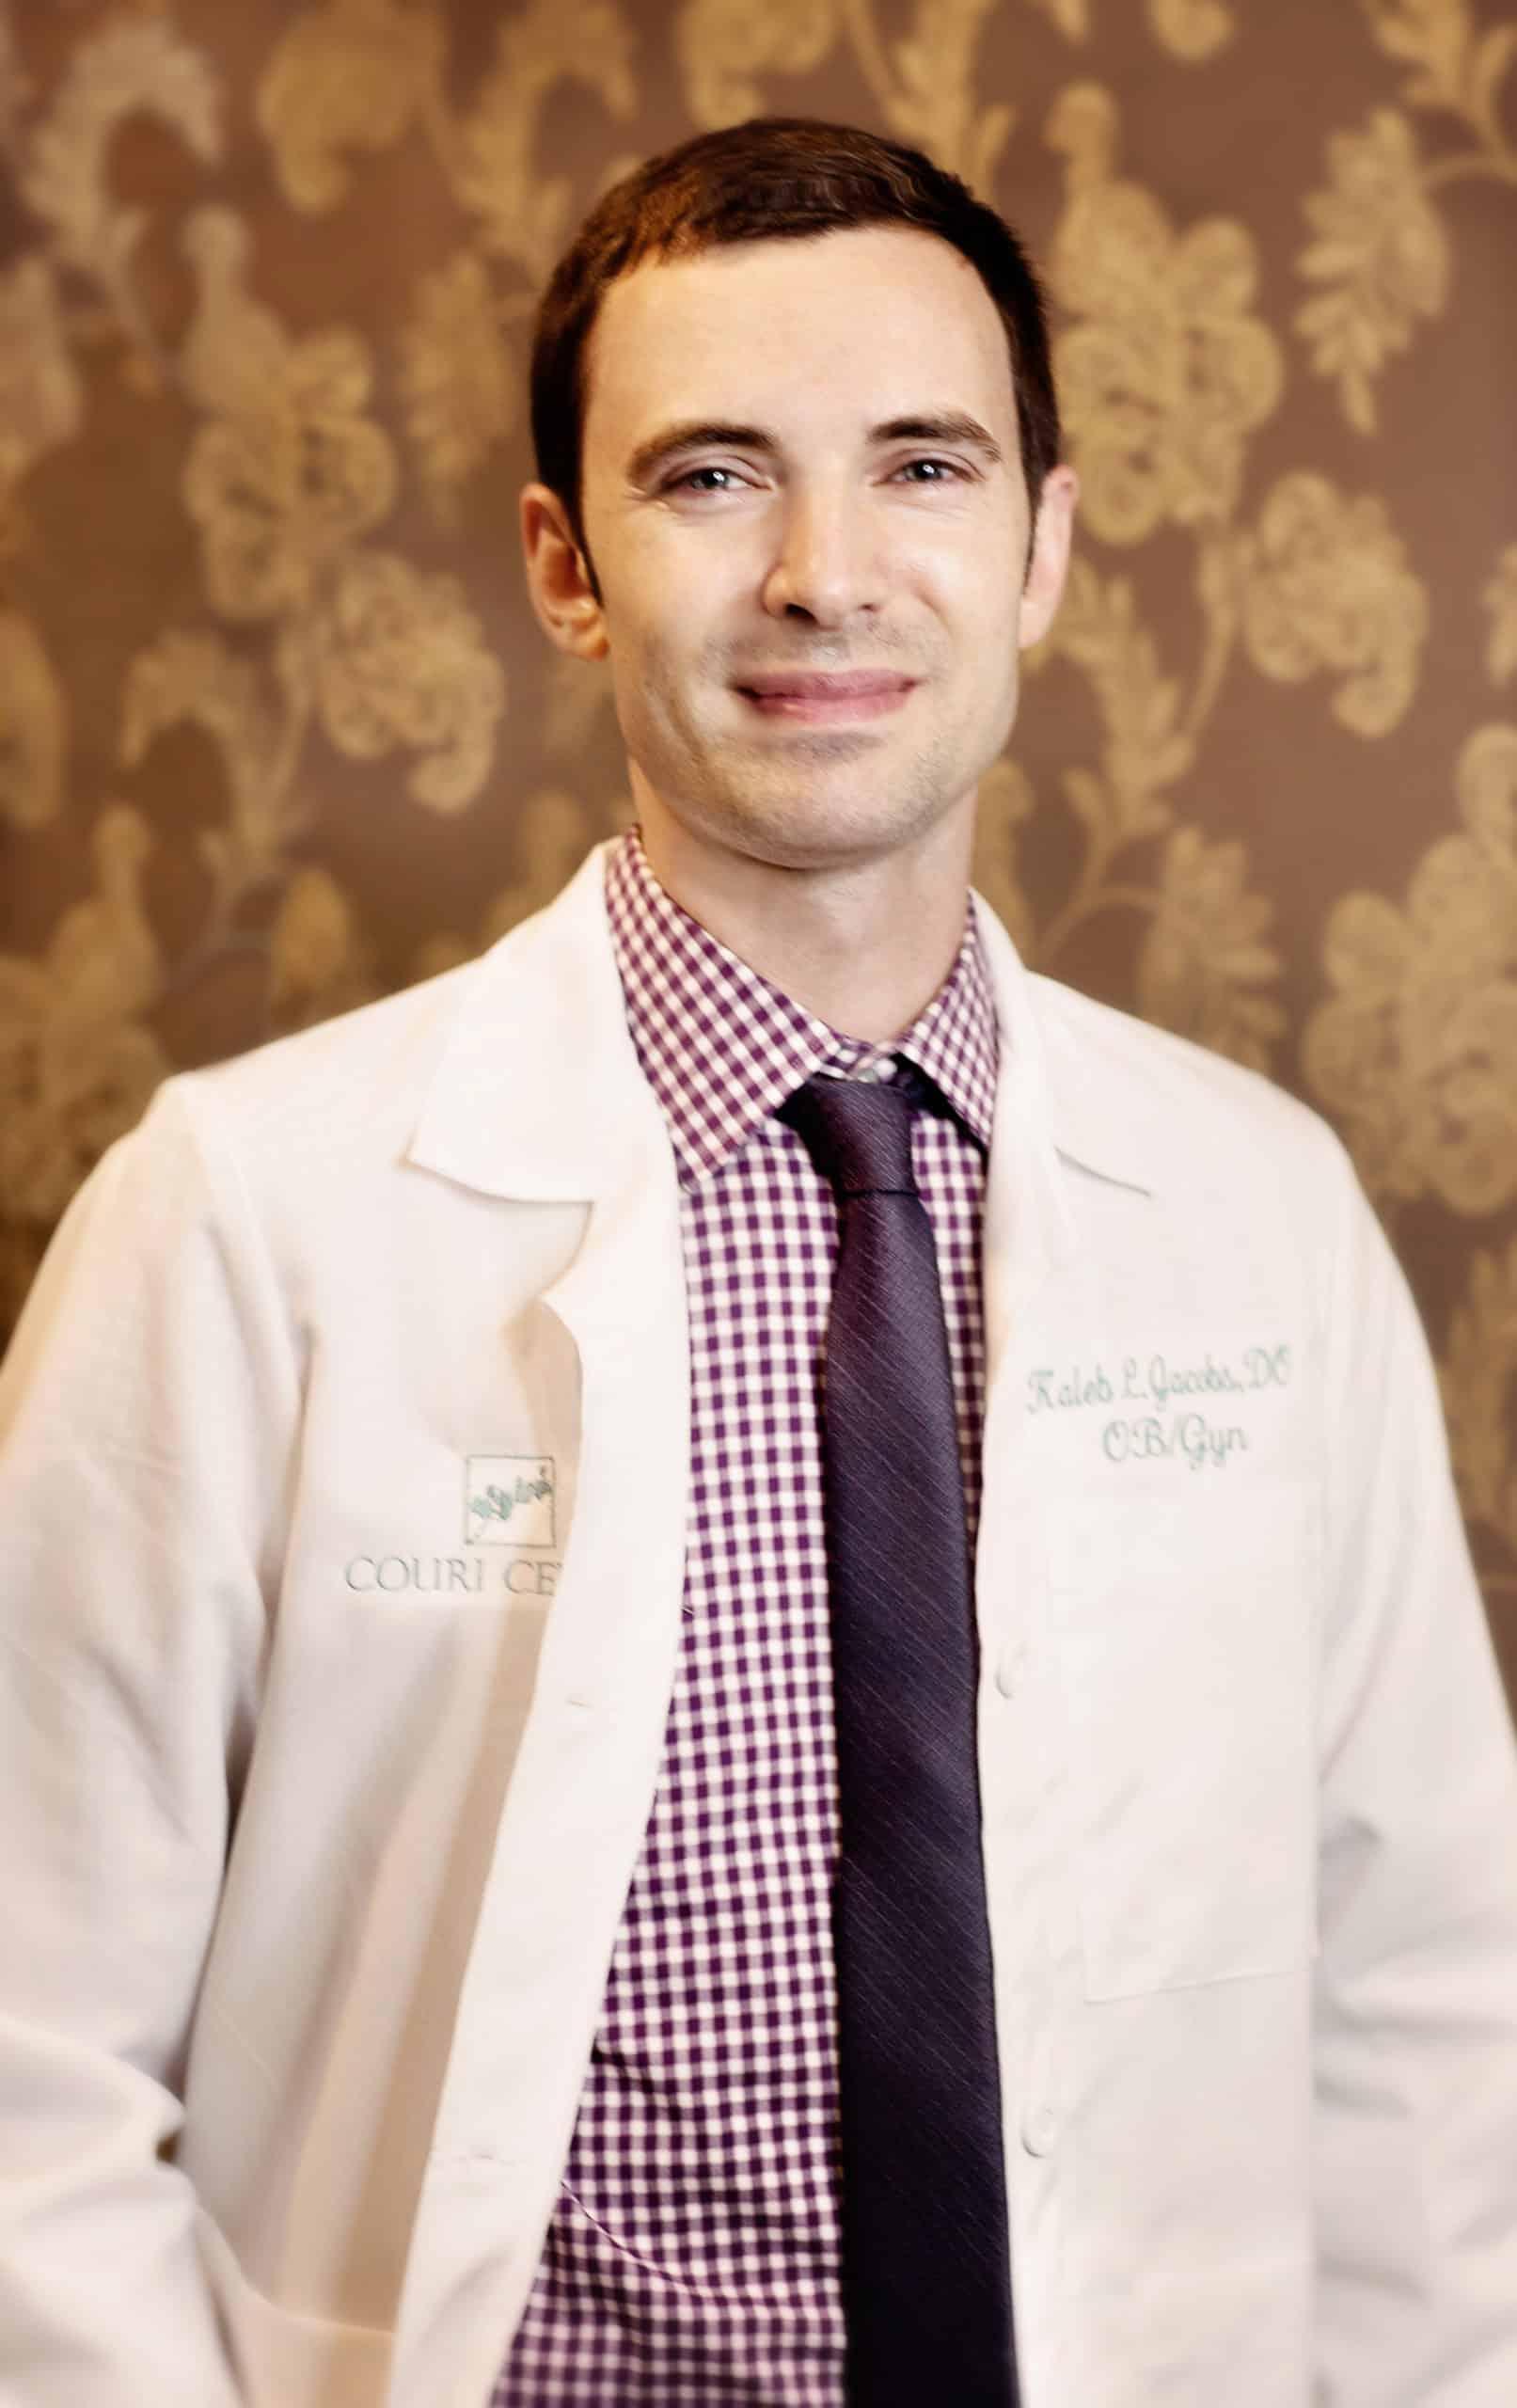 Dr. Kalbe Jacobs